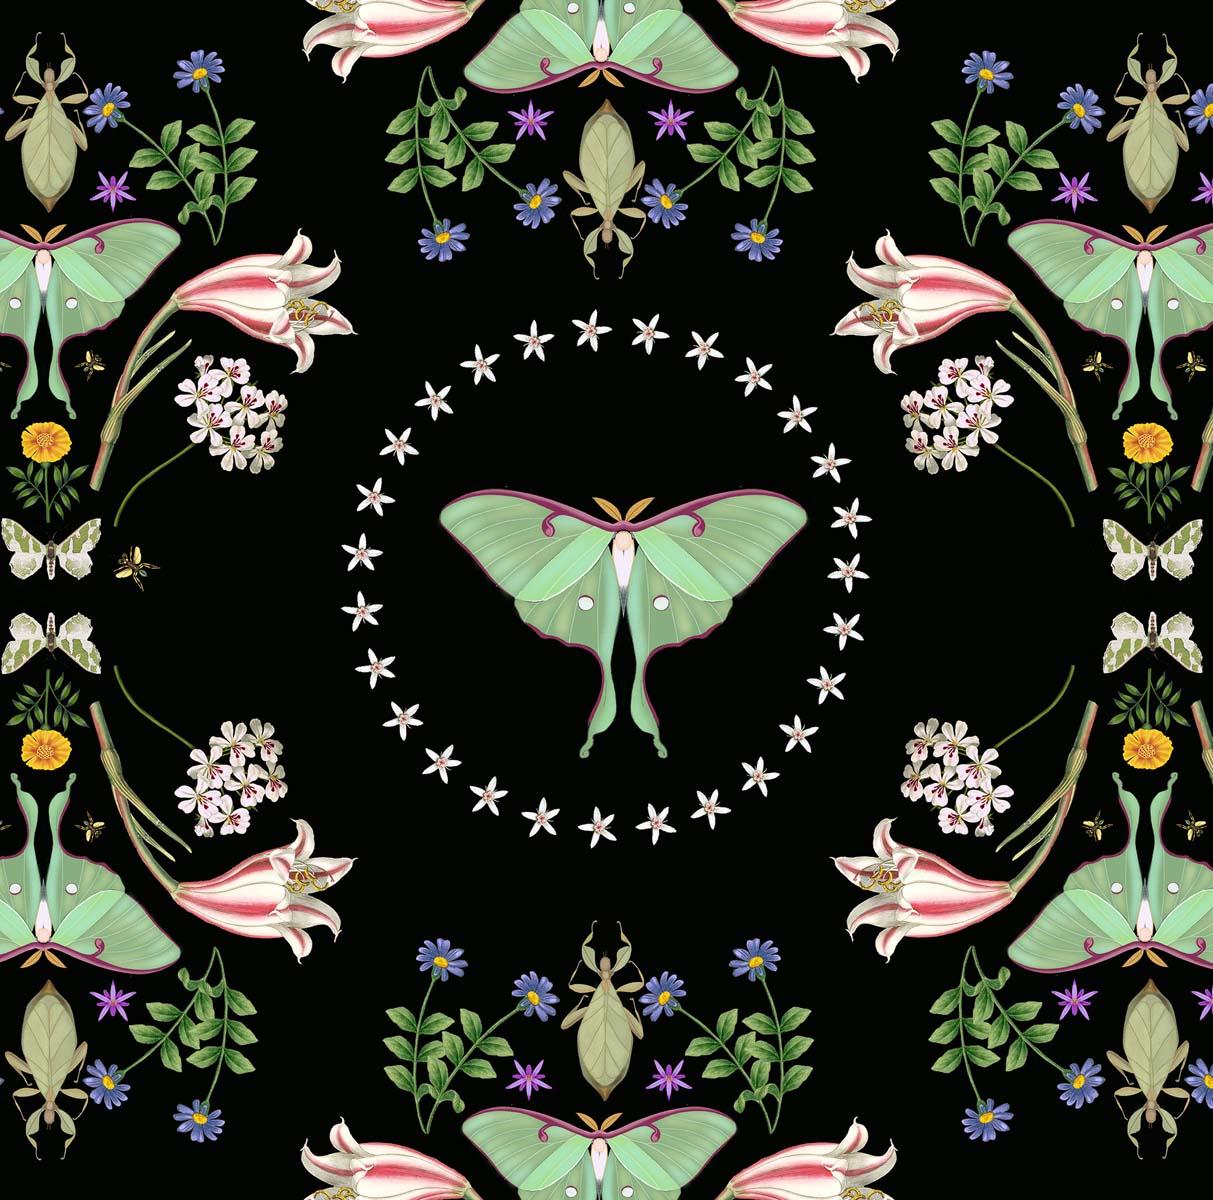 Luna Moth Design Applied